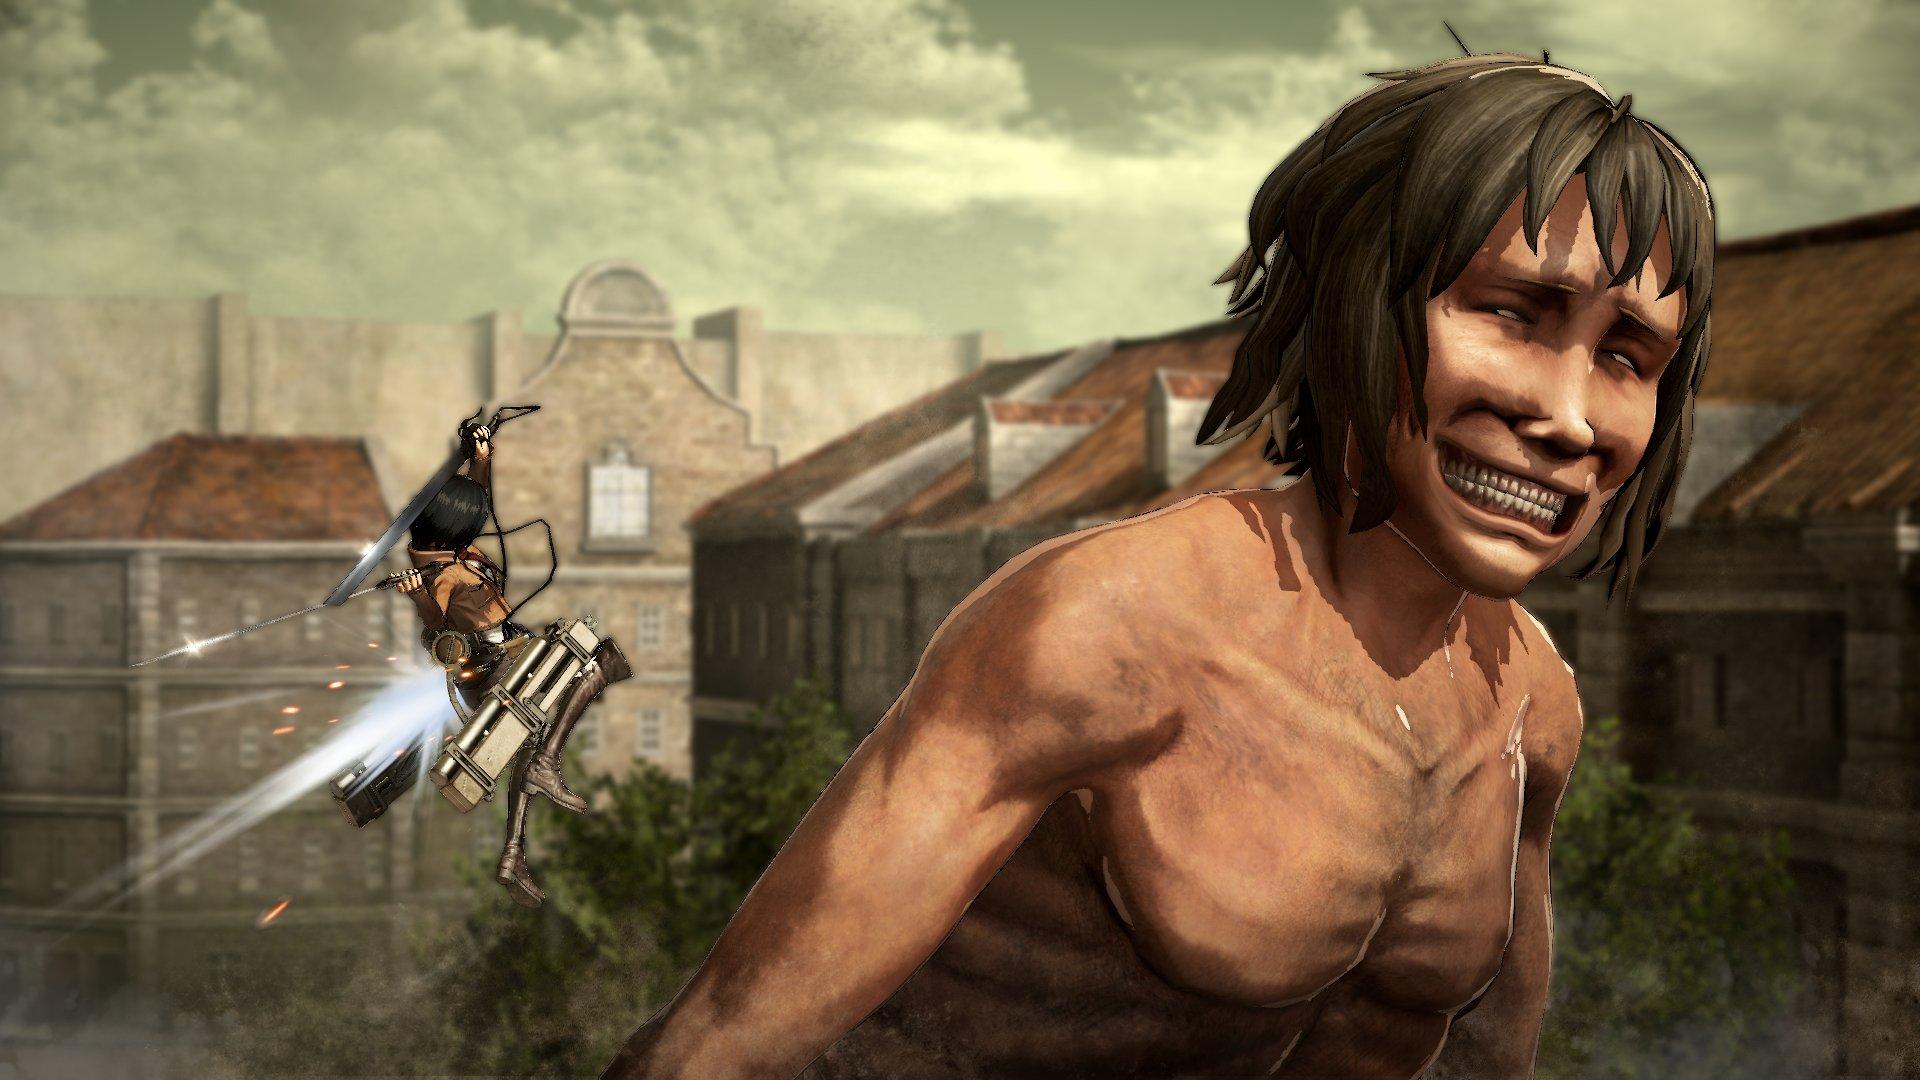 Attack on Titan Battle Footage, Pre-Order Bonuses & More Revealed 4